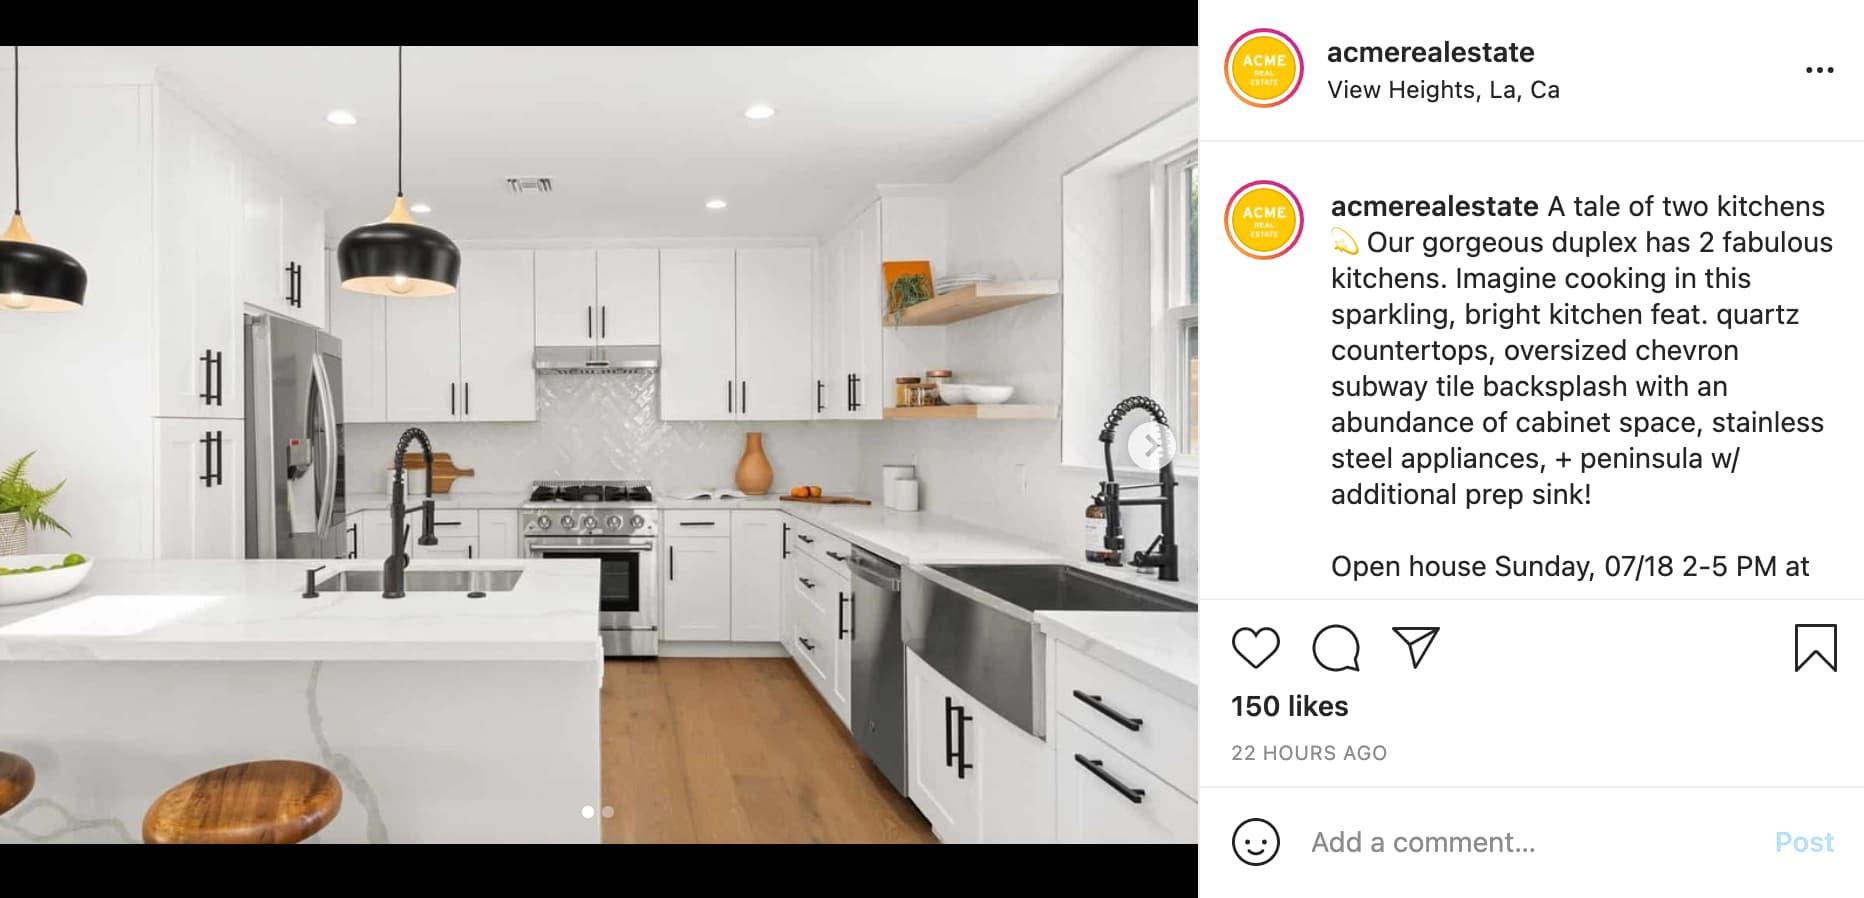 Acme Real Estate Ad